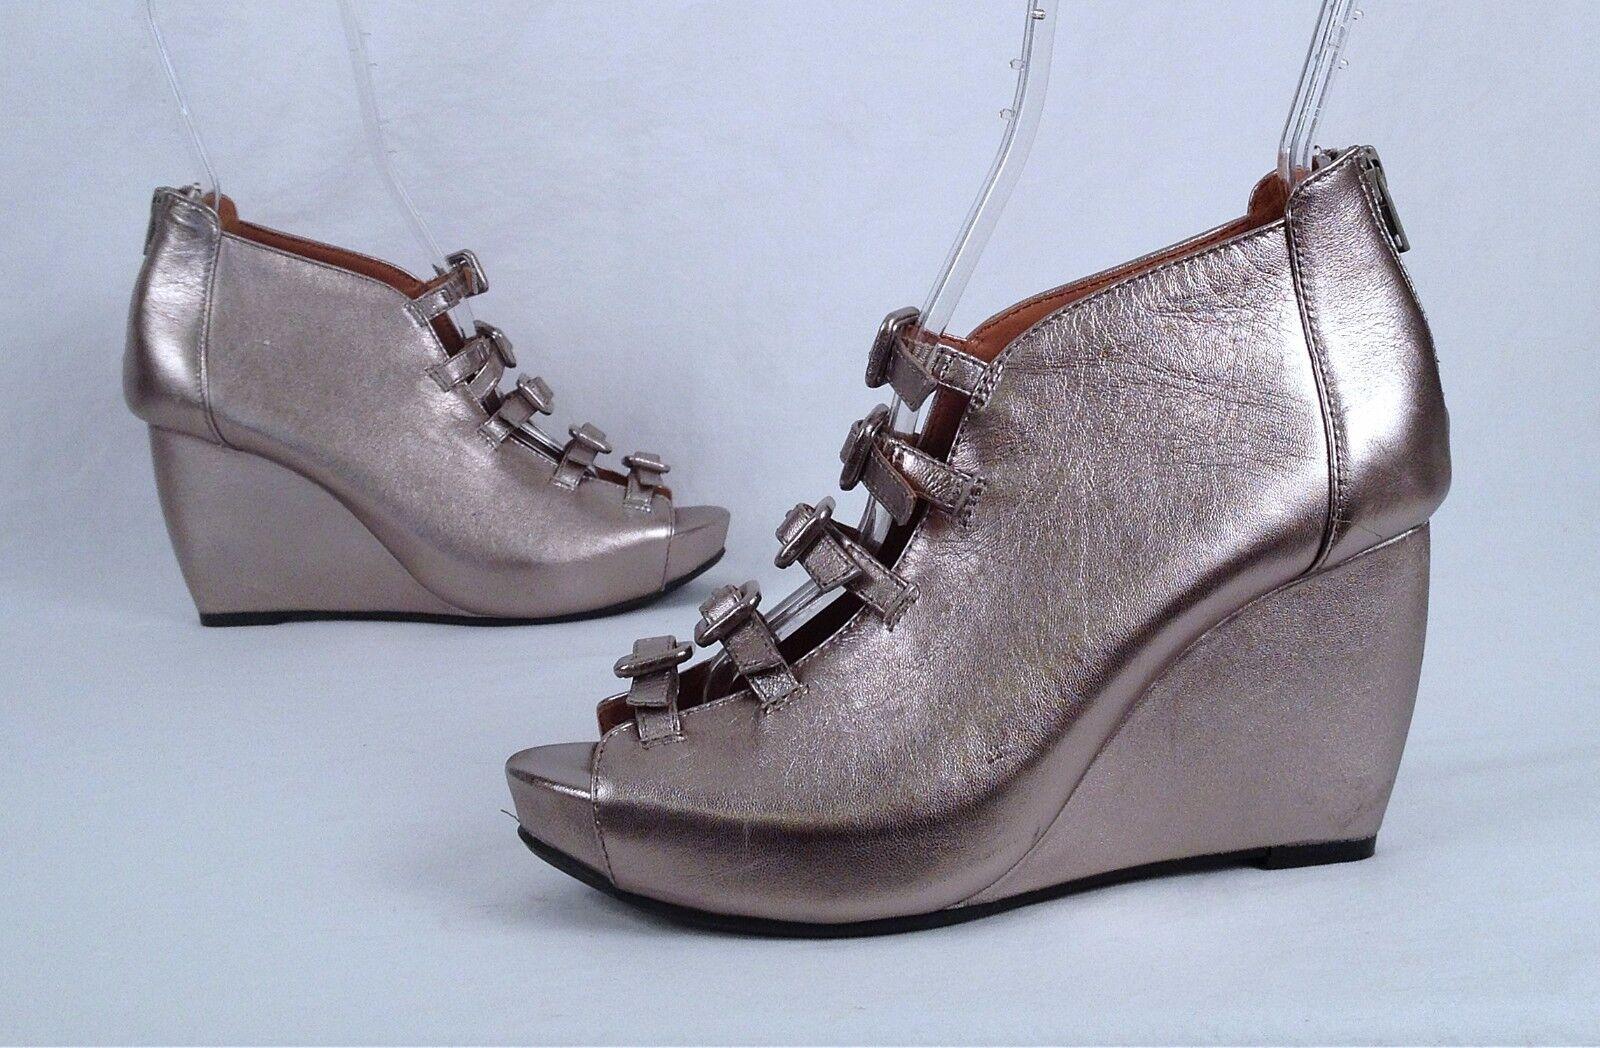 NEW   L'Amore Des Pieds Wedge Sandal- Metallilc  - Dimensione 7 M   245  (P0)